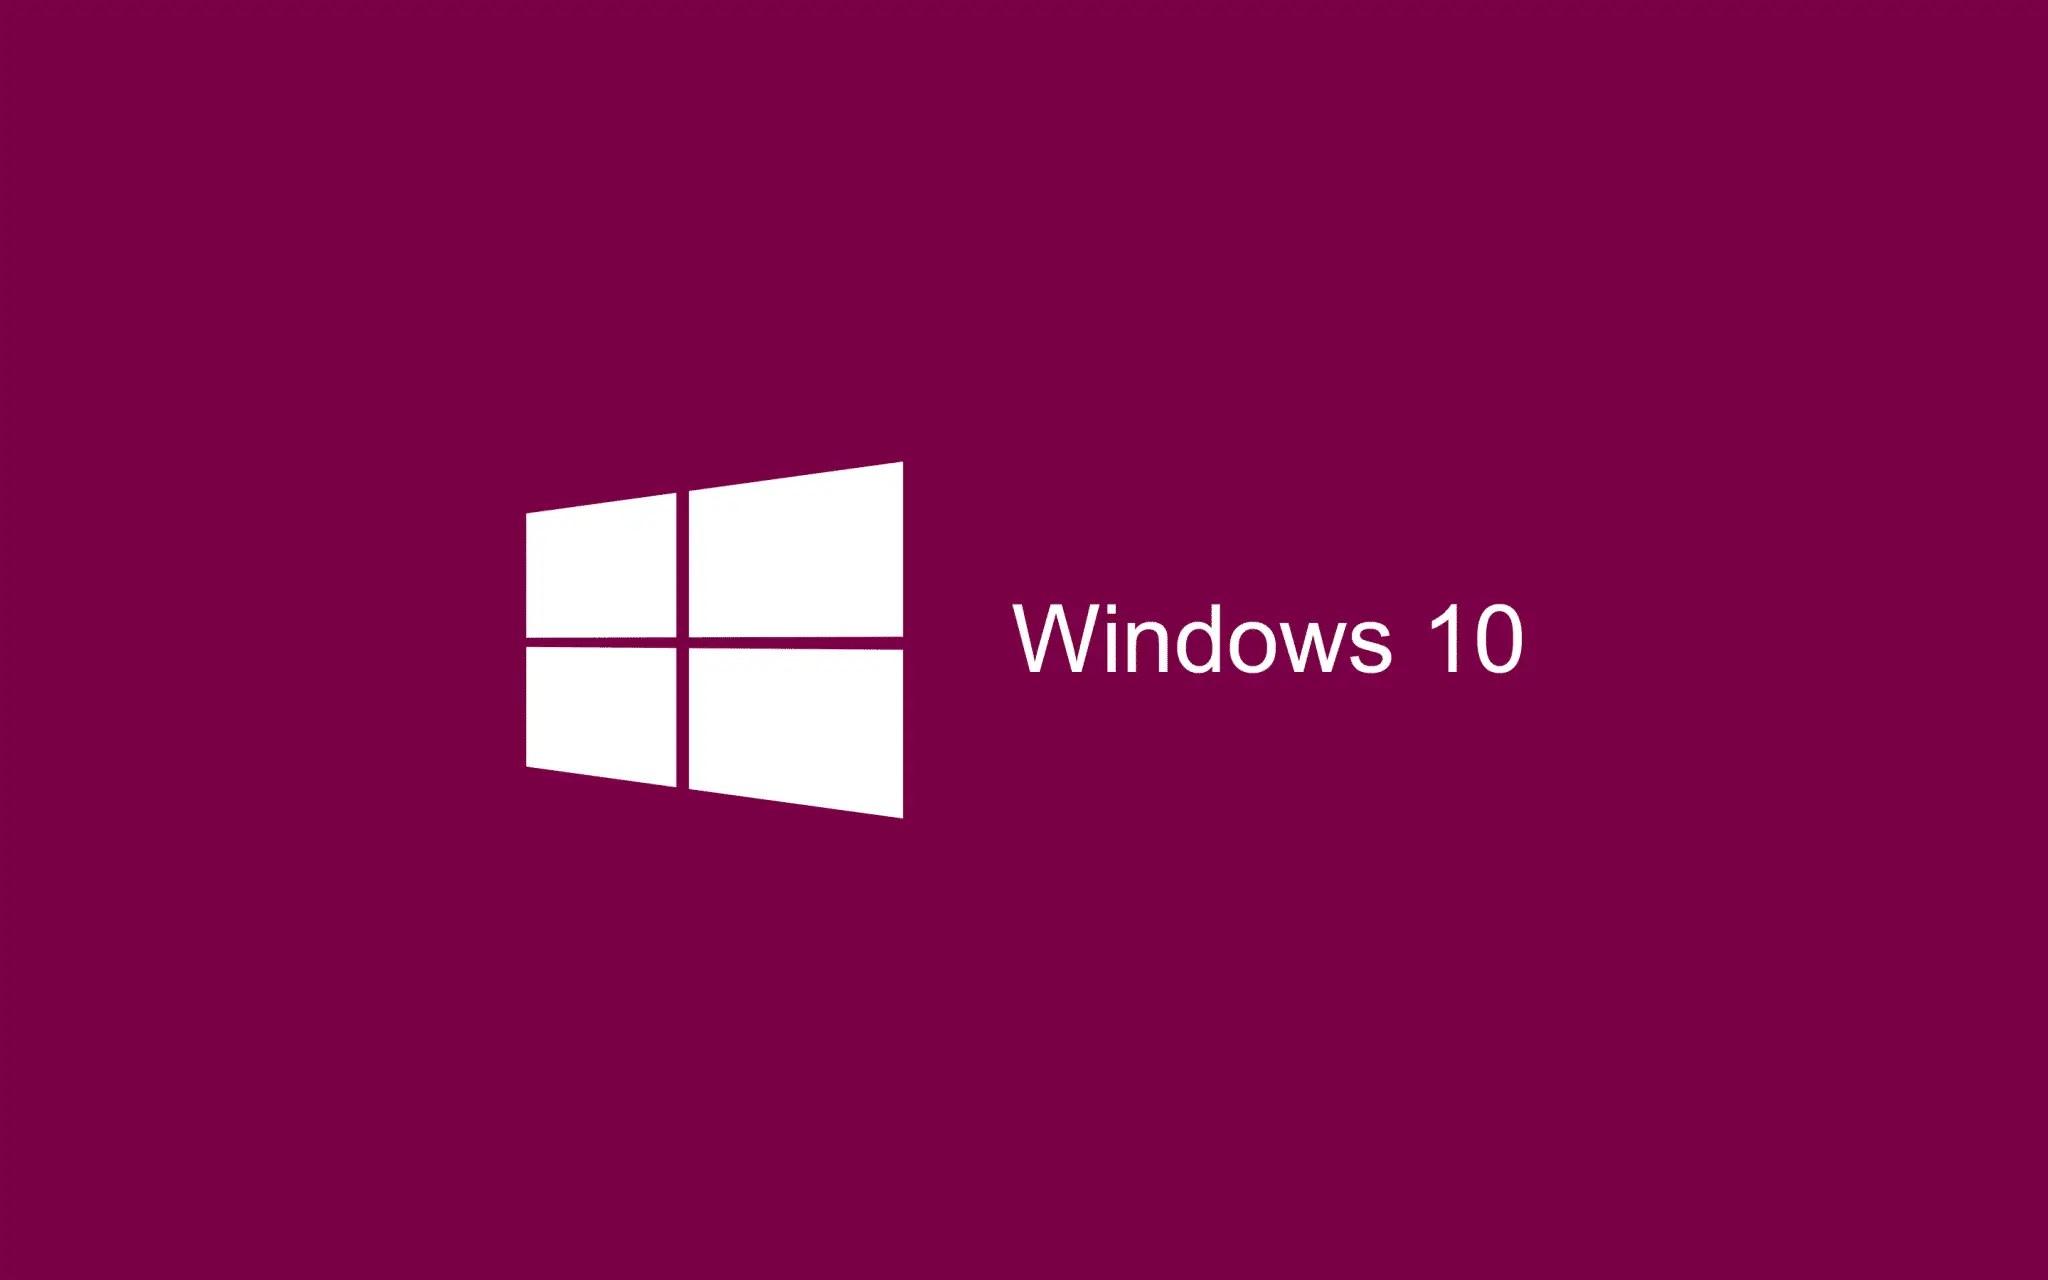 Magenta Pink Wallpaper Windows 10 HD 2880x1800